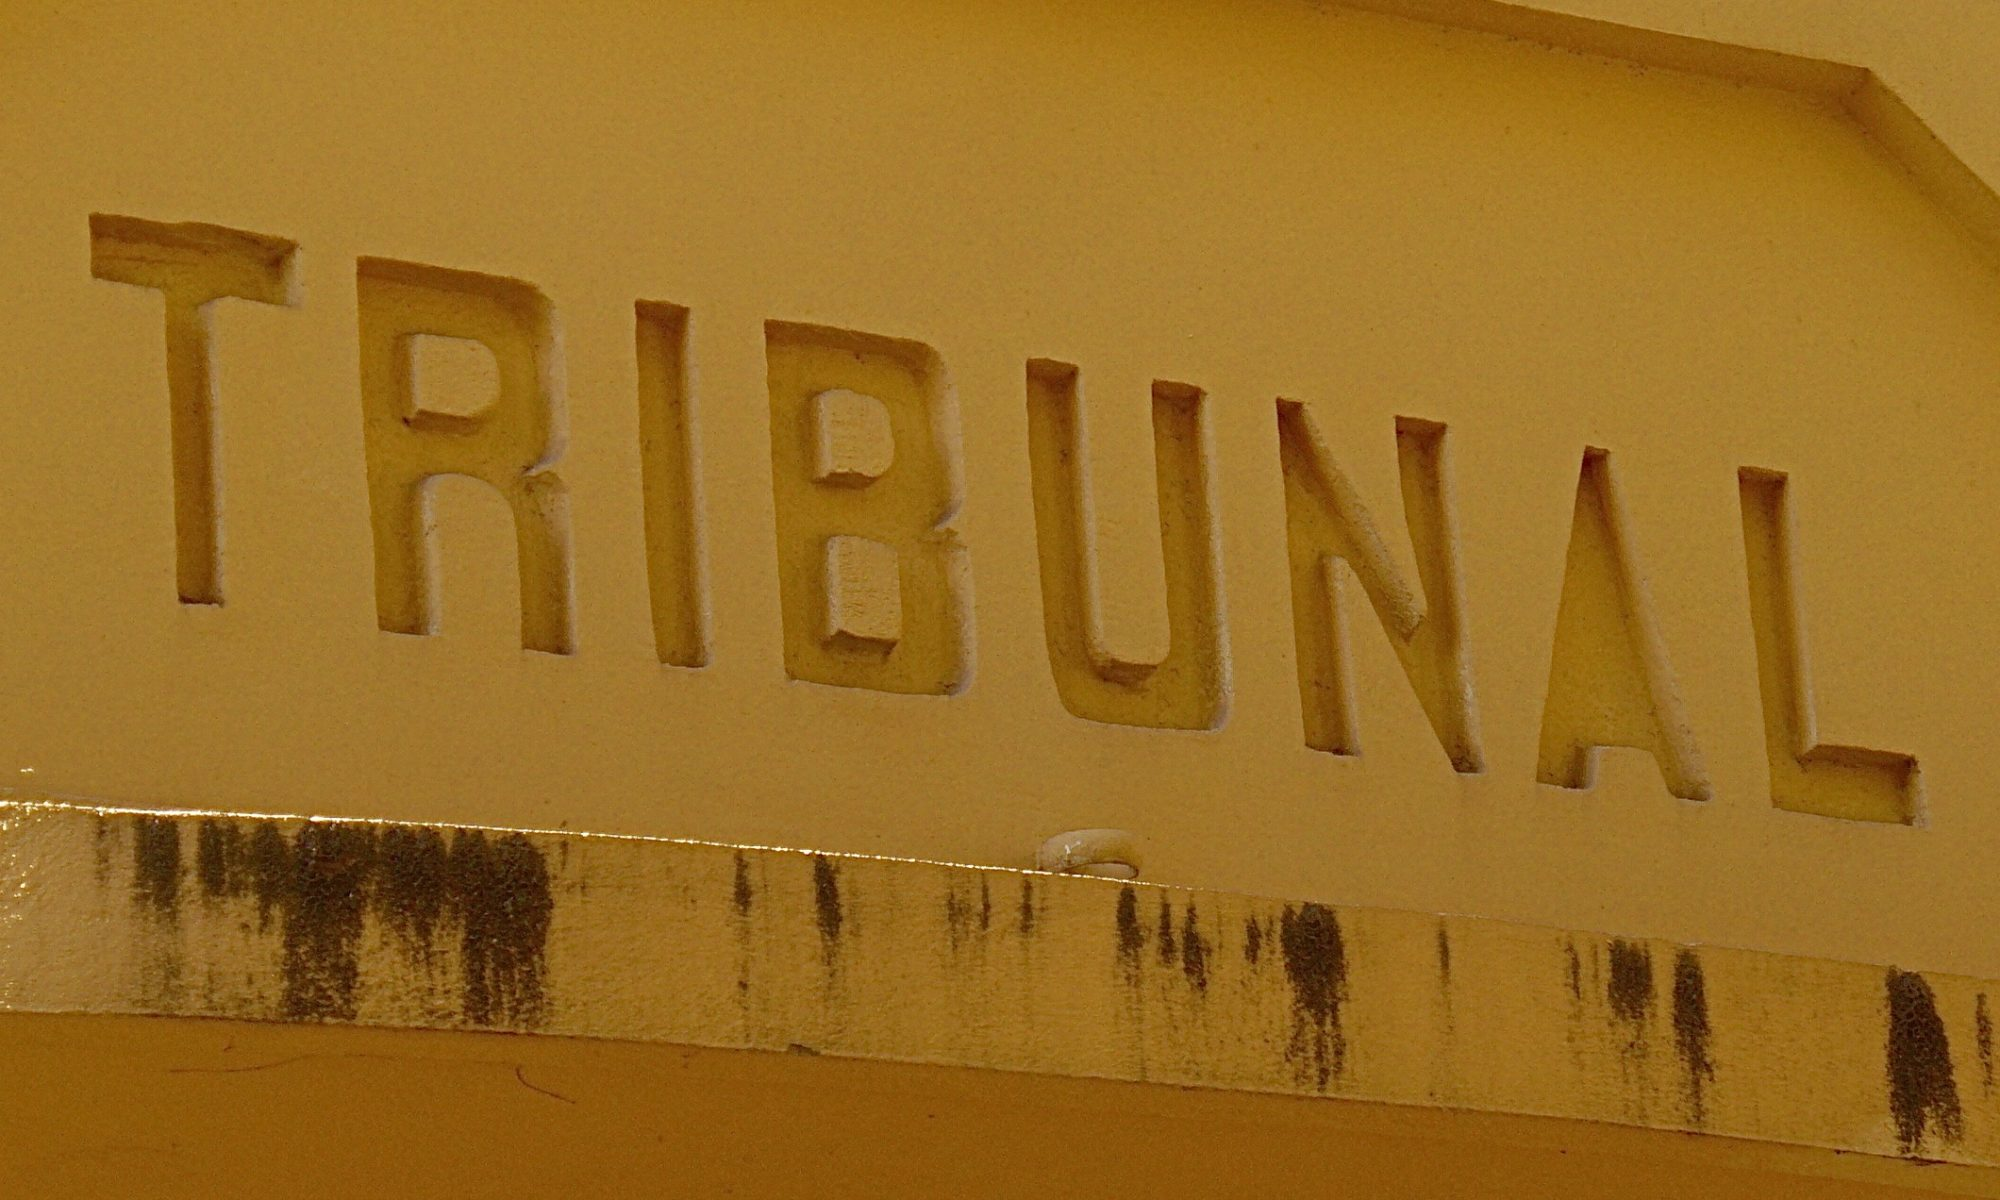 Tribunal d'Antibes, CC-by par Roberto Venturini https://flic.kr/p/8NZiJe